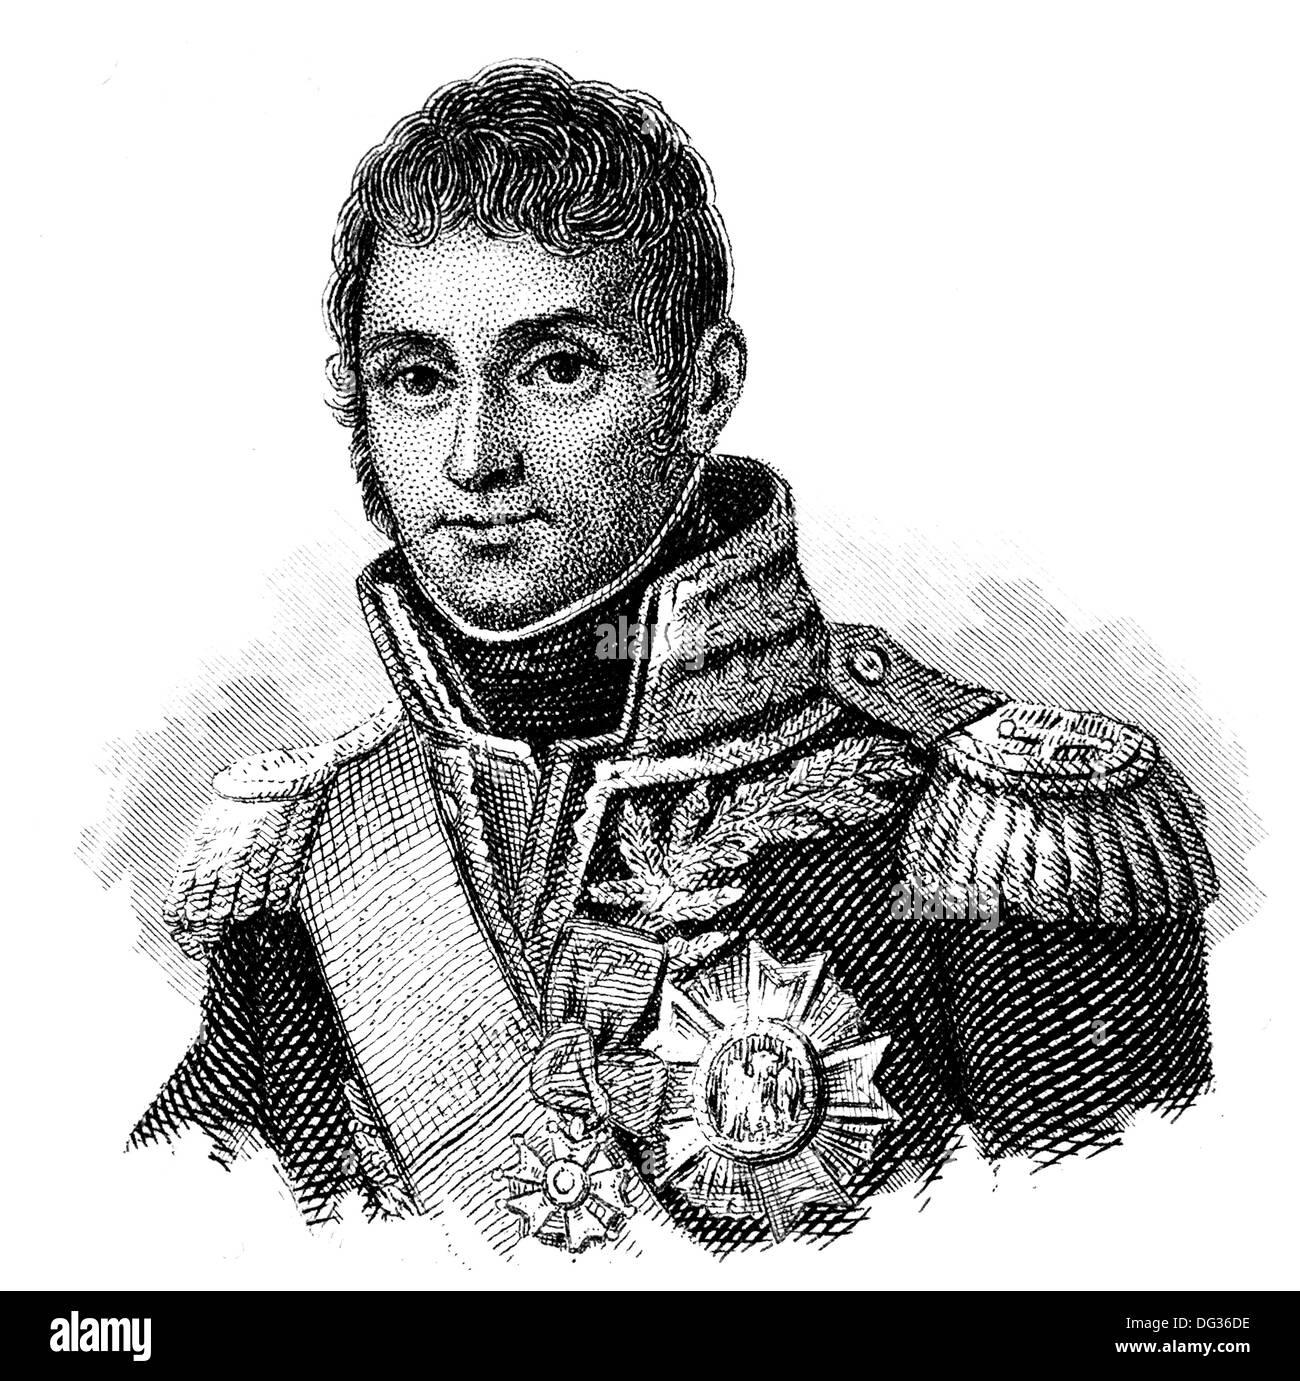 André Masséna or Andrea Massena, 1st Duc de Rivoli, 1st Prince d'Essling, 1758-1817, a French military commander during the Revo Stock Photo